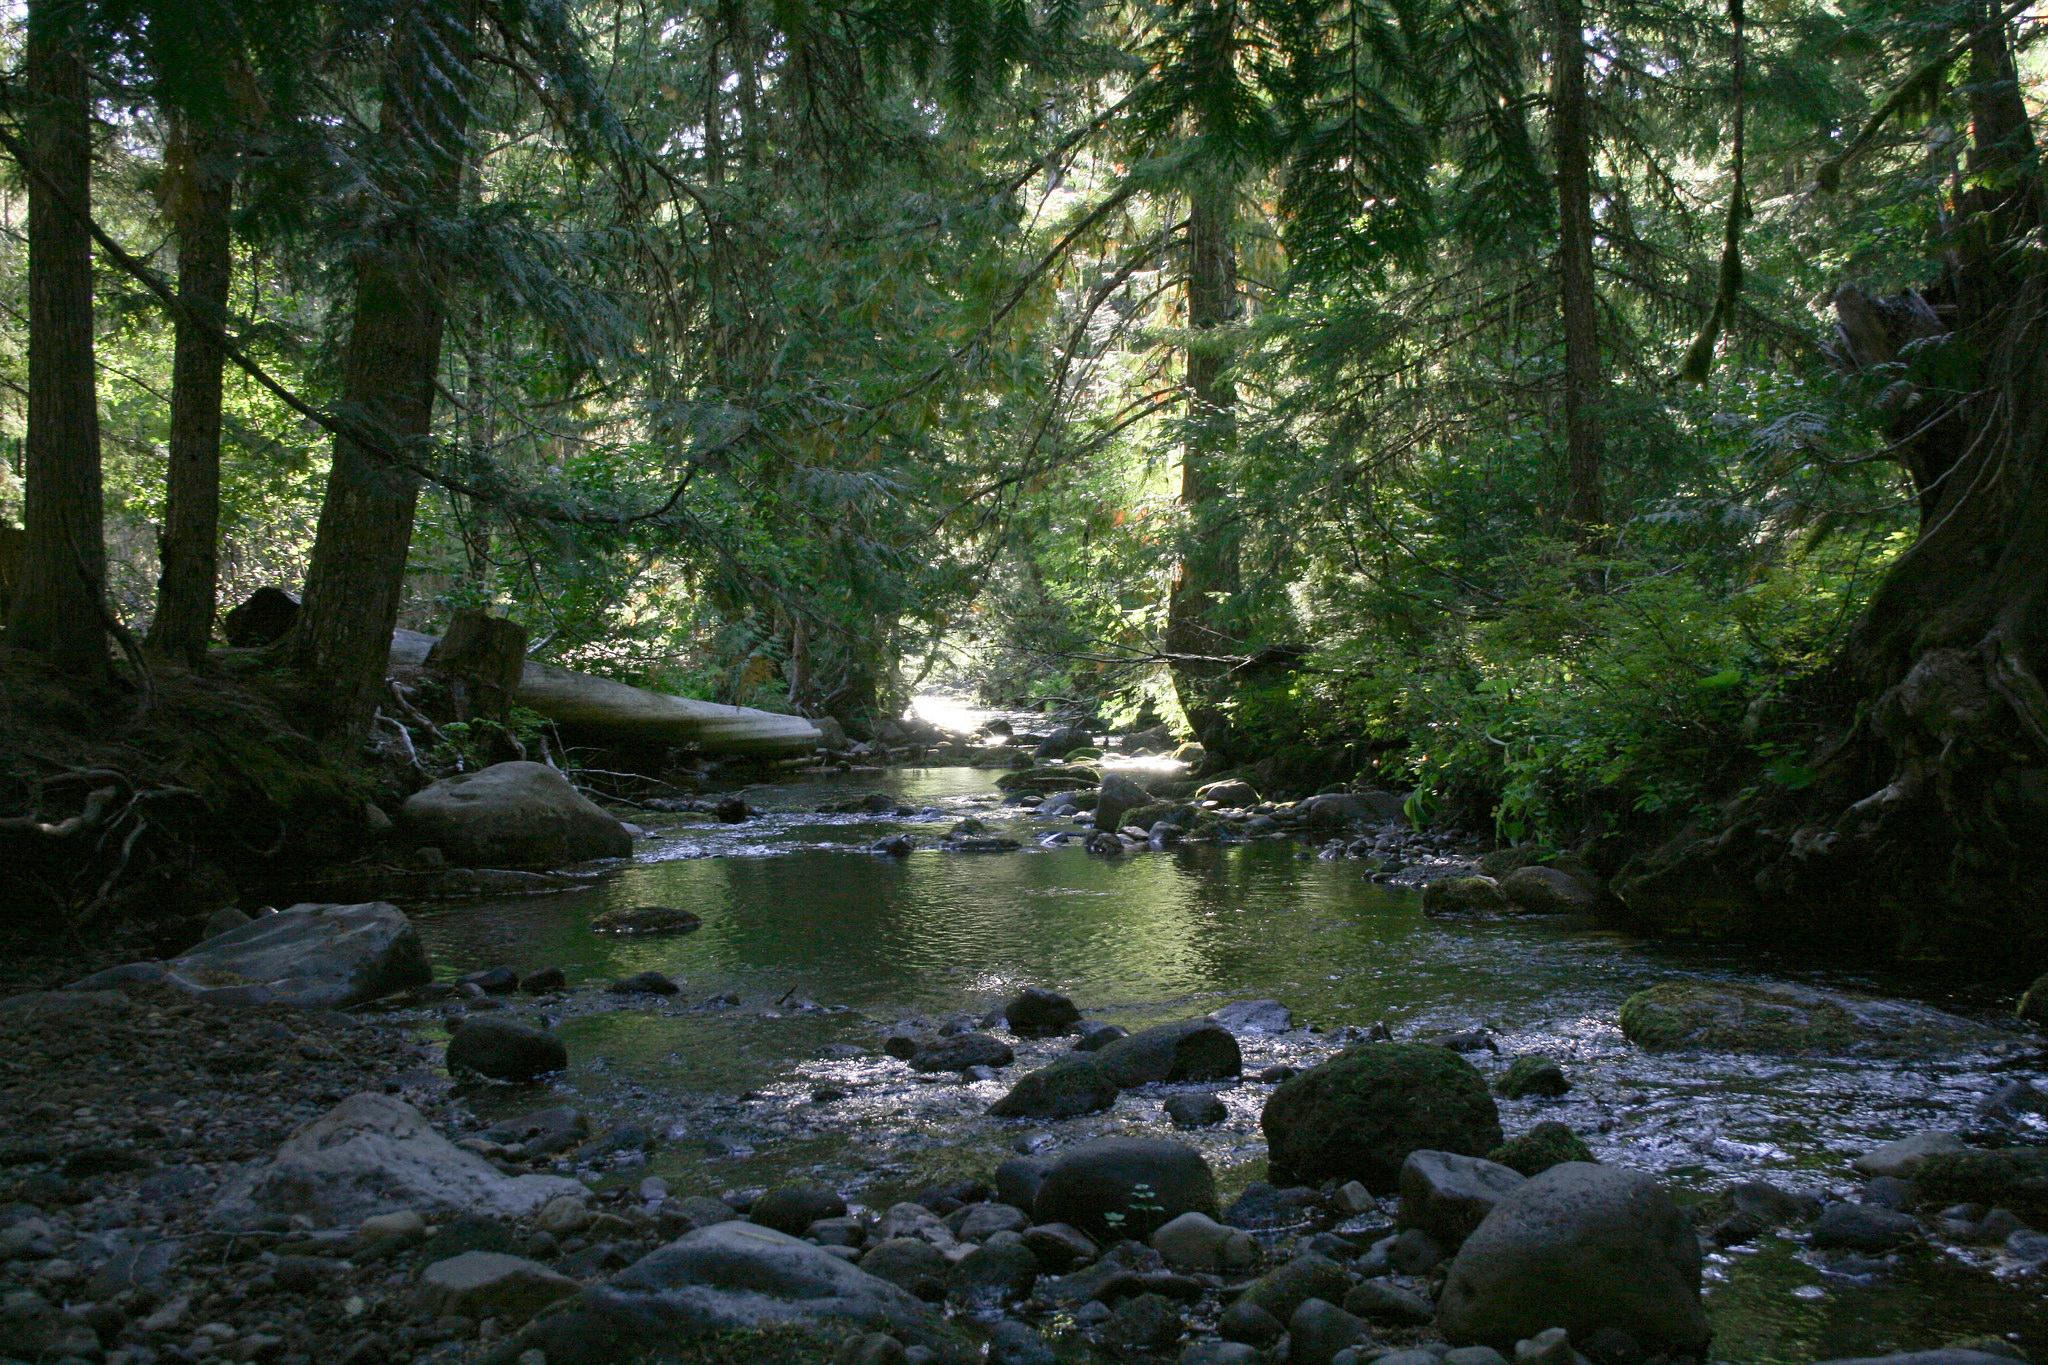 mt_hood_national_forest